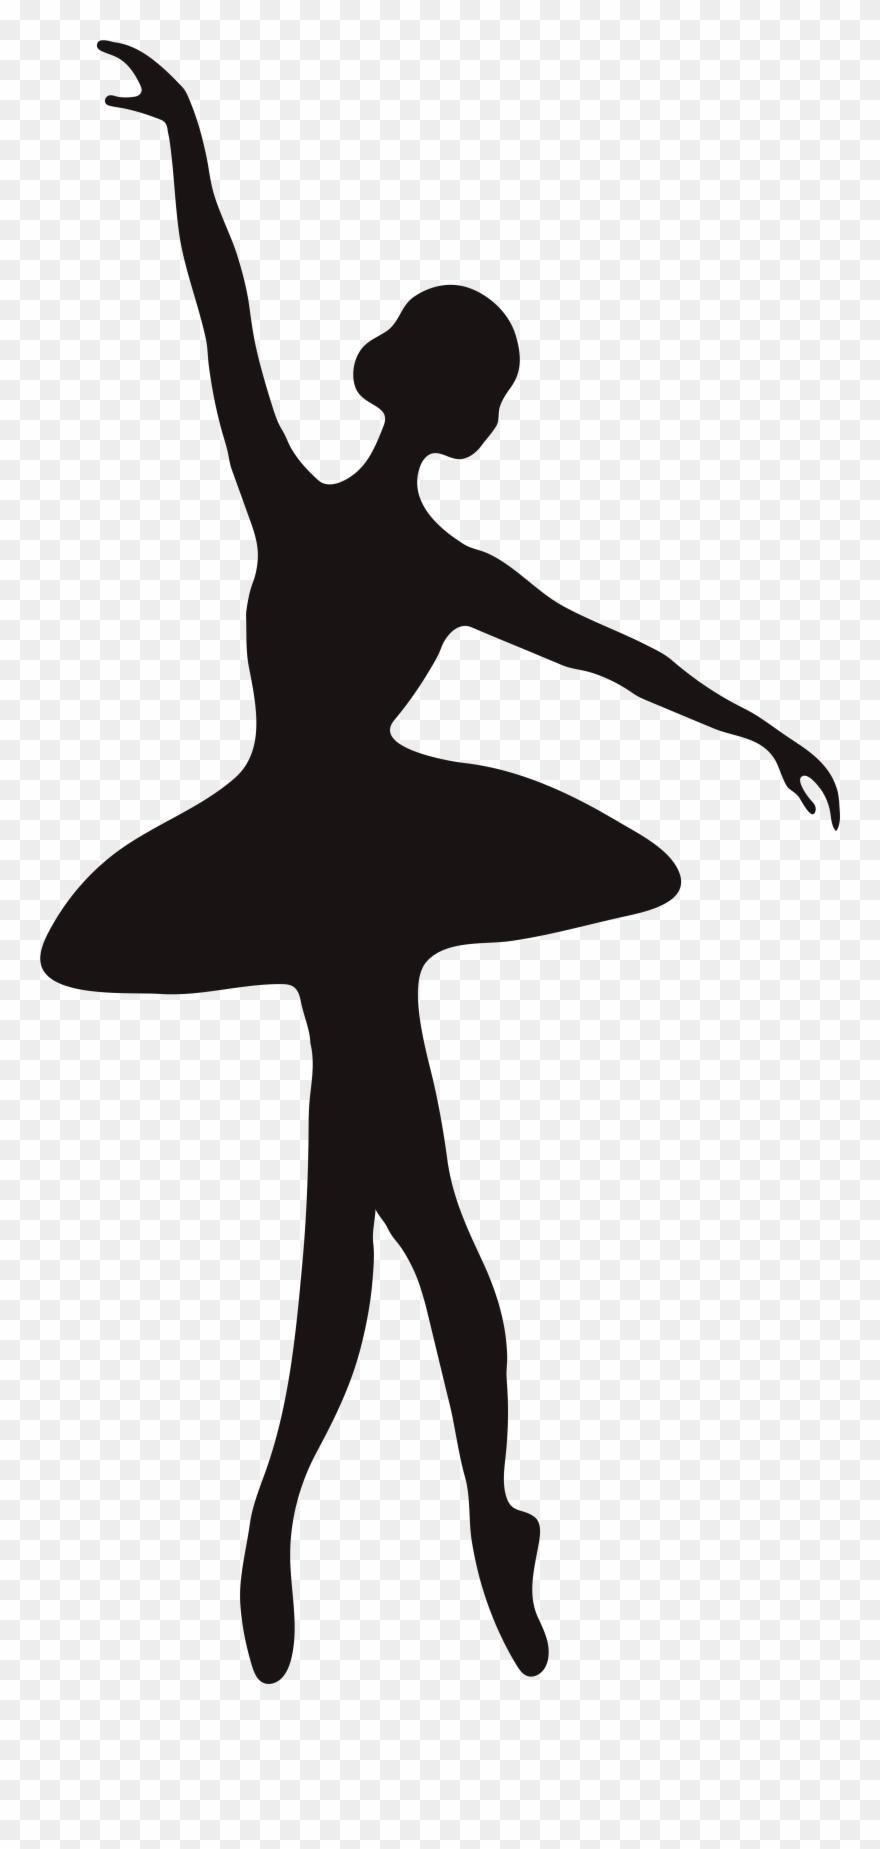 hight resolution of ballerina silhouette png clip art imageu200b gallery ballet dancer silhouette png transparent png